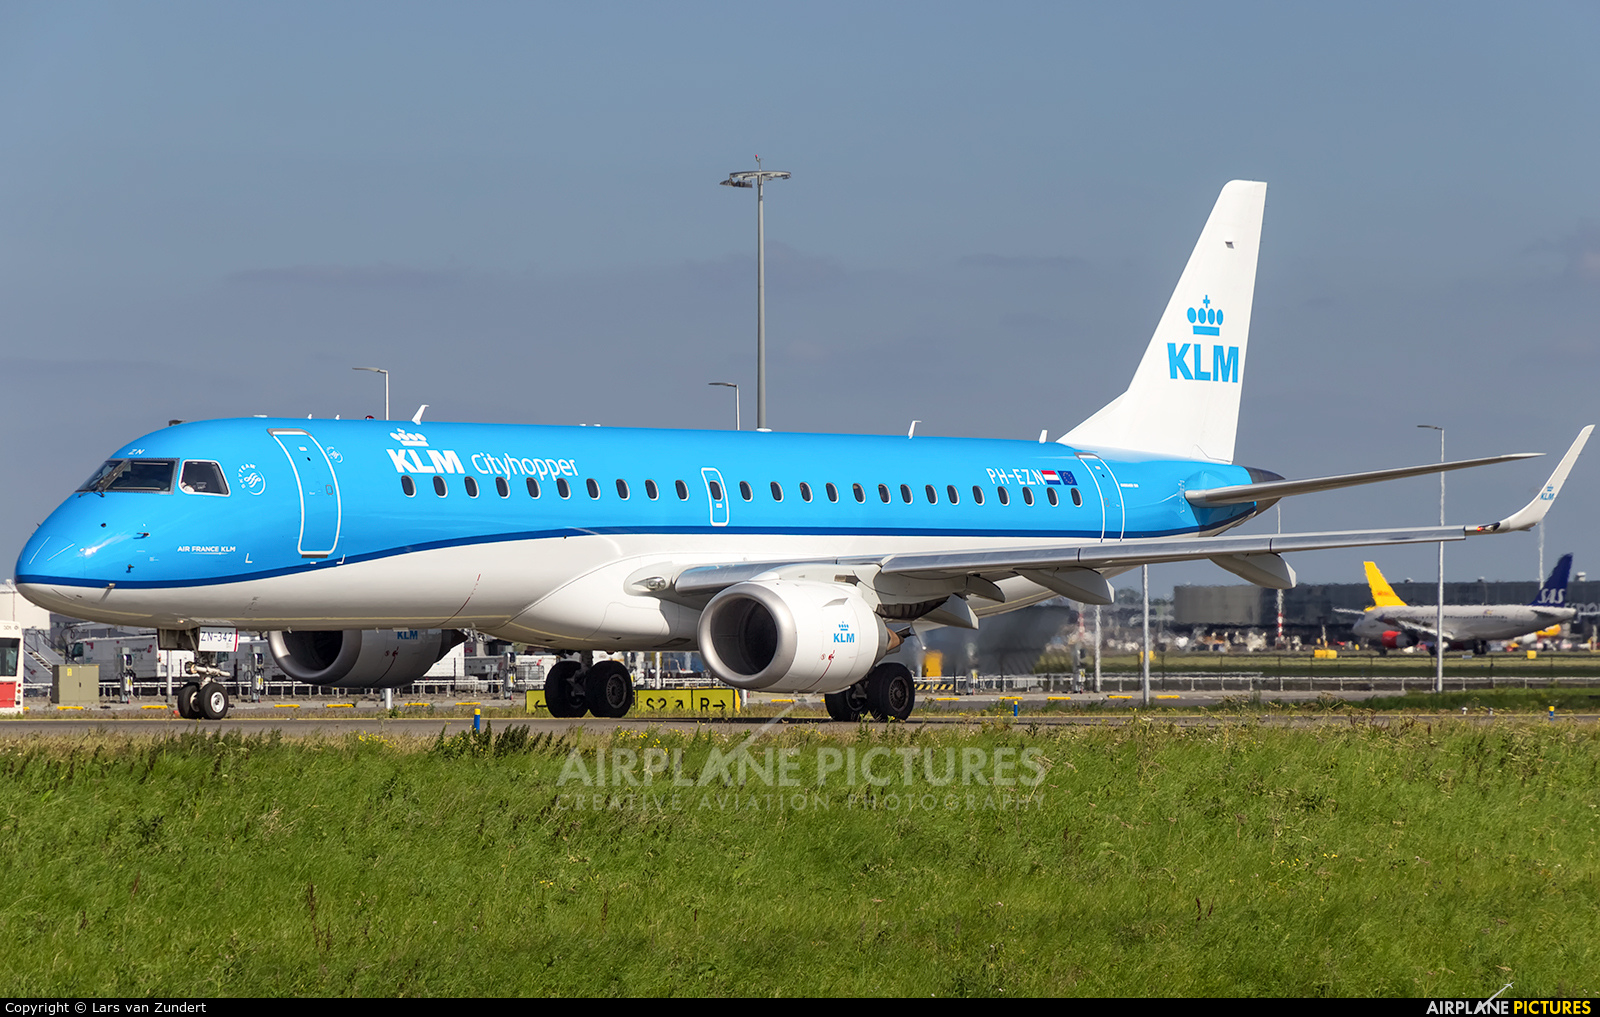 KLM Cityhopper PH-EZN aircraft at Amsterdam - Schiphol